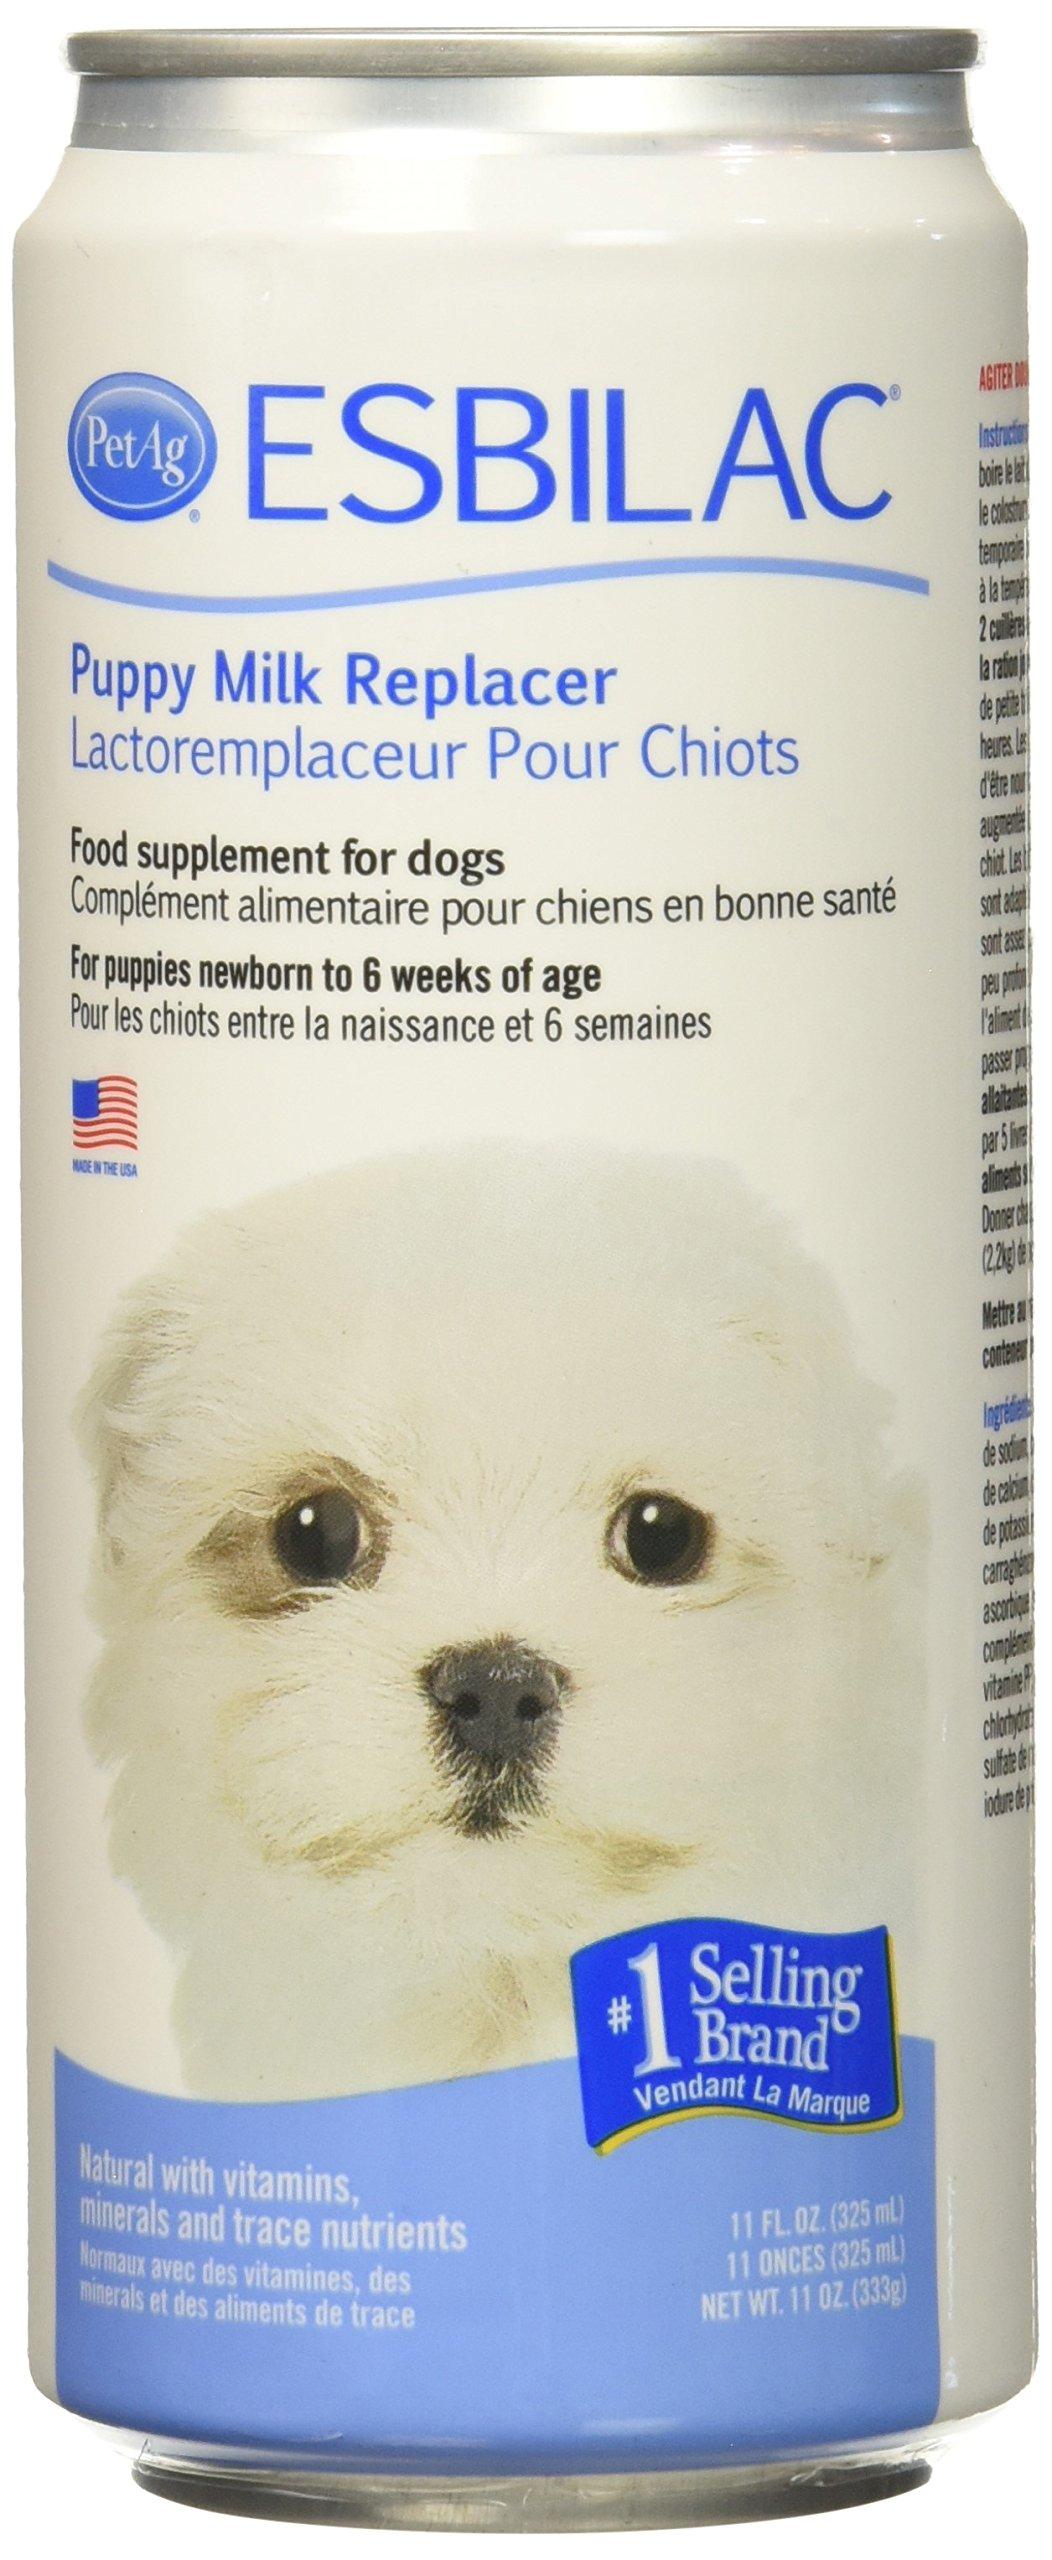 Esbilac (6 Pack) Liquid for Puppies, Milk Replacer - 11 Ounces Each by Esbilac